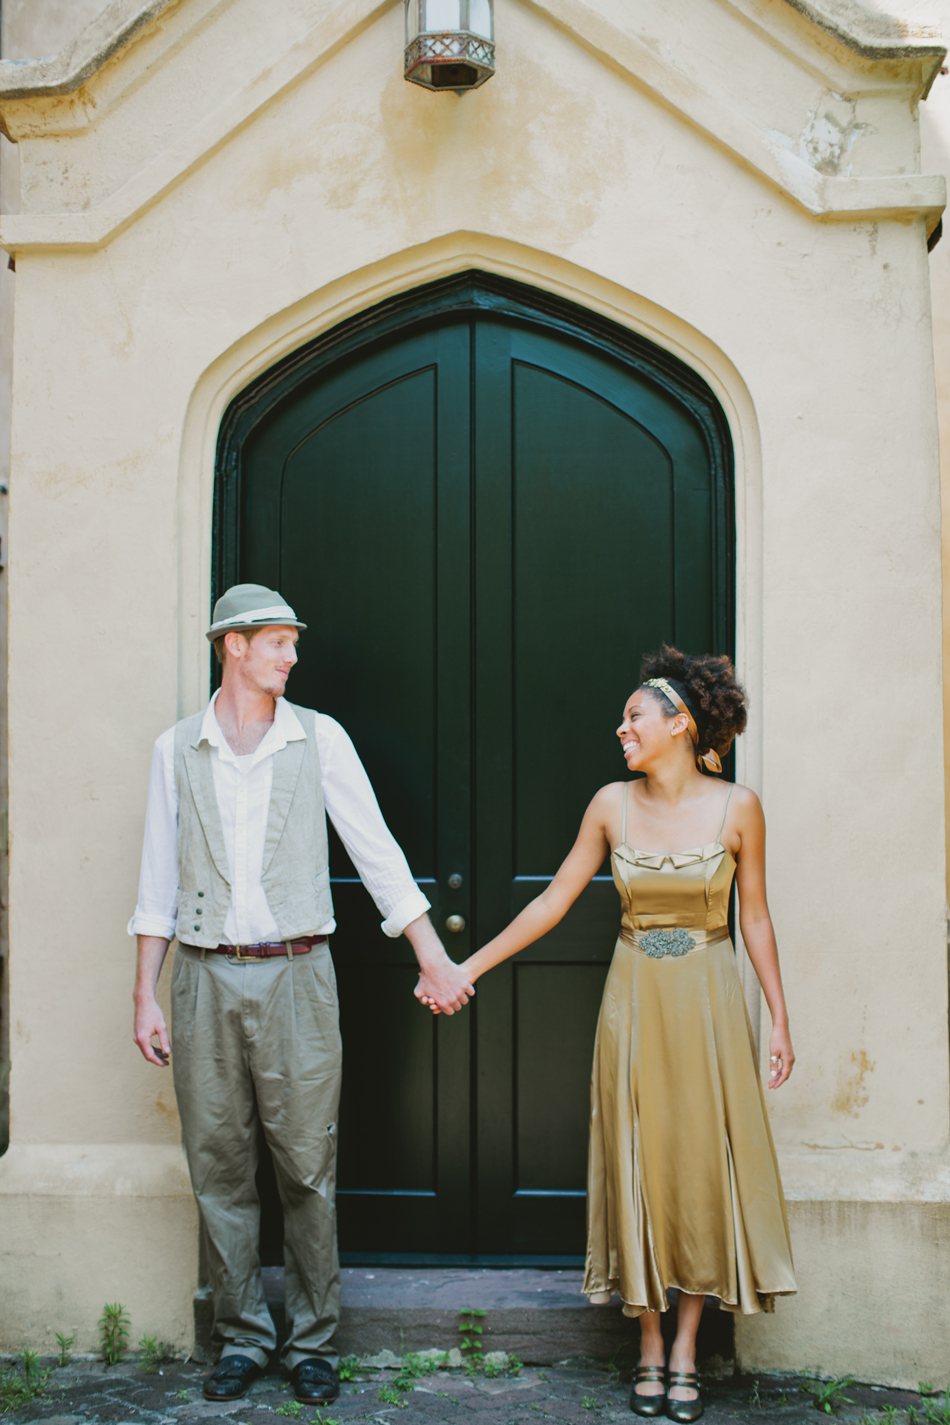 Jameykay_arlie_bohemian_elopement_styled_shoot012.jpg